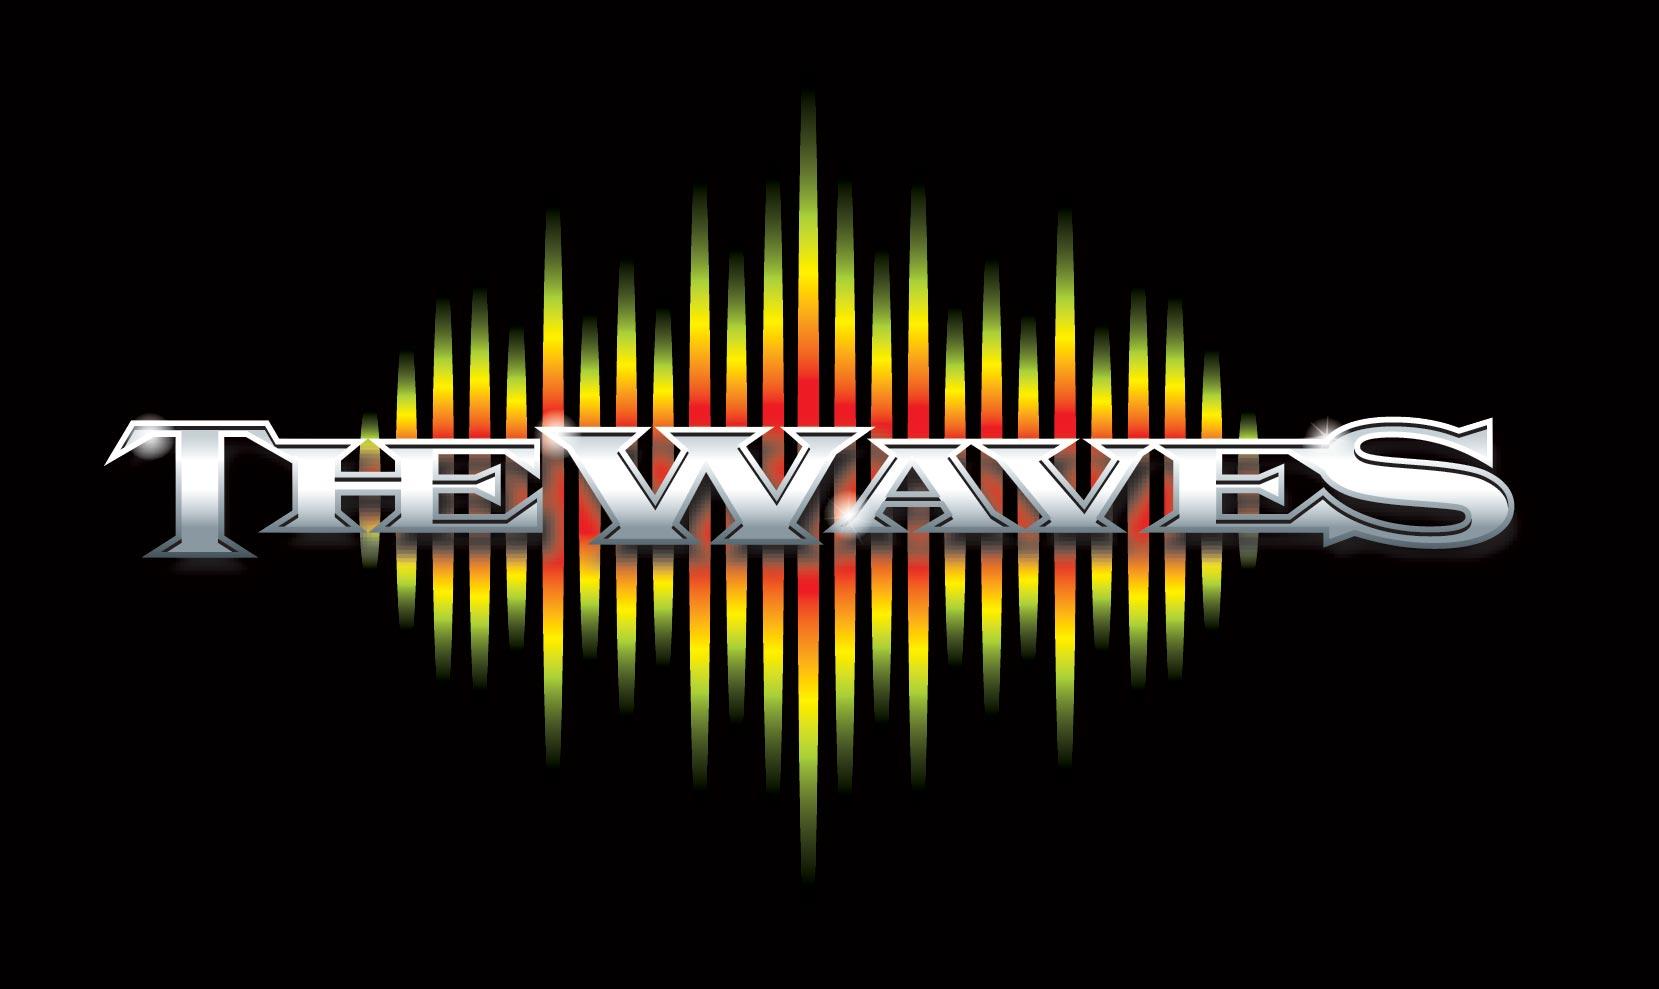 thewaves_low_fi_2014_logo